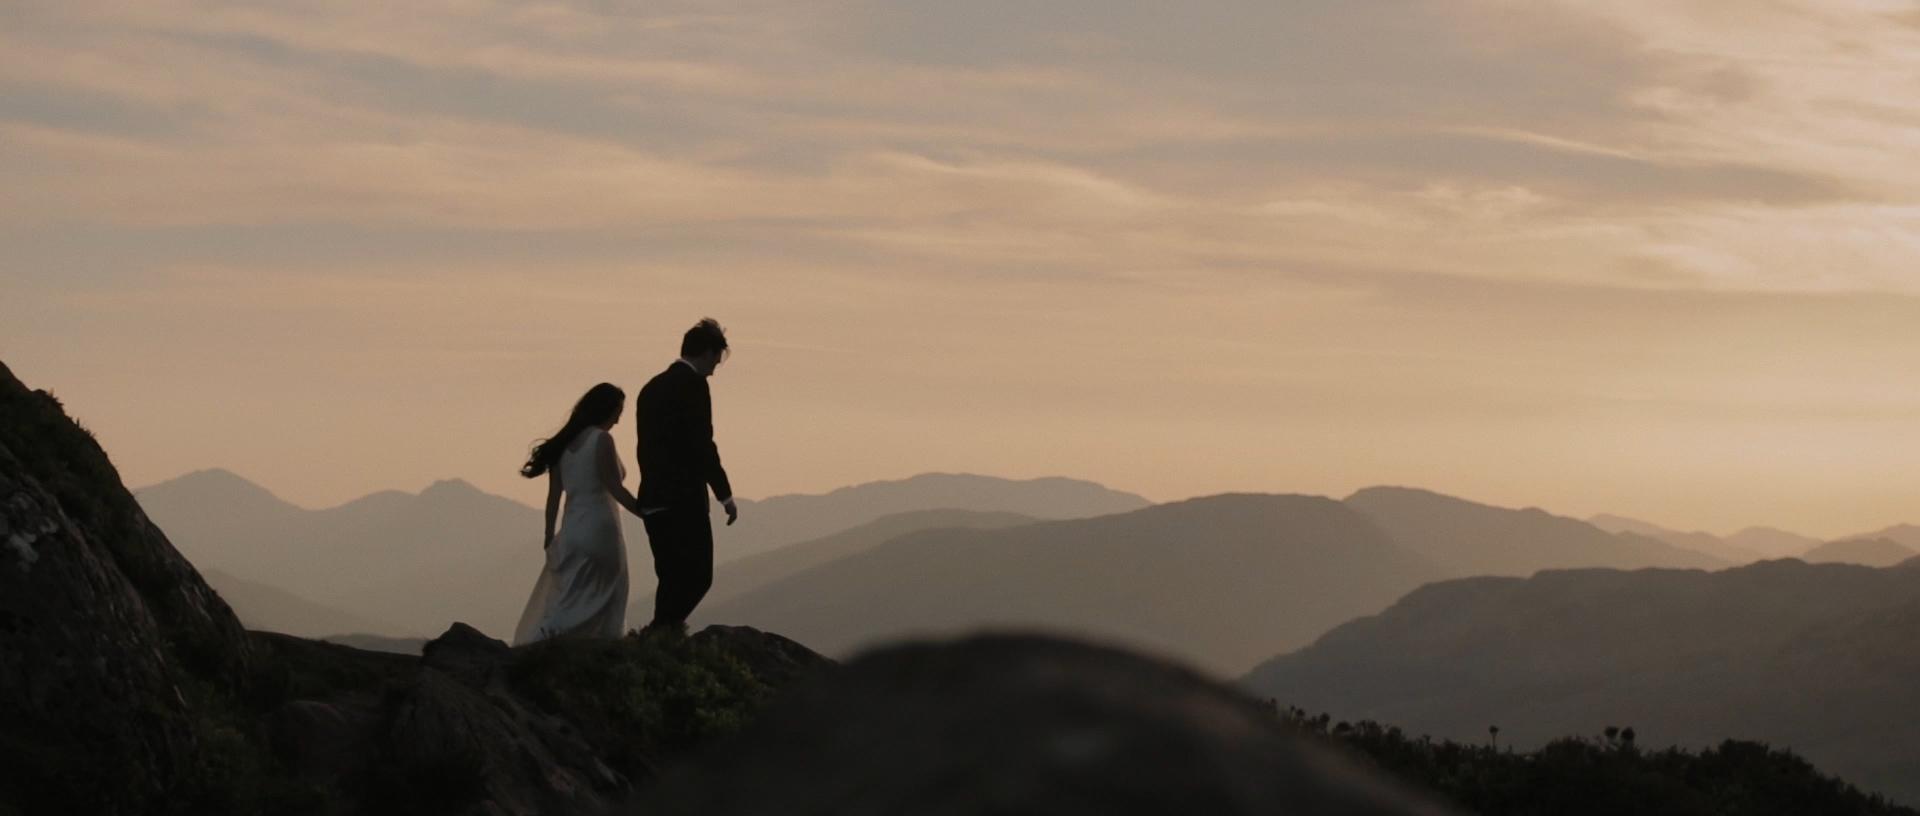 killearn-village-hall-wedding-videographer_LL_01.jpg